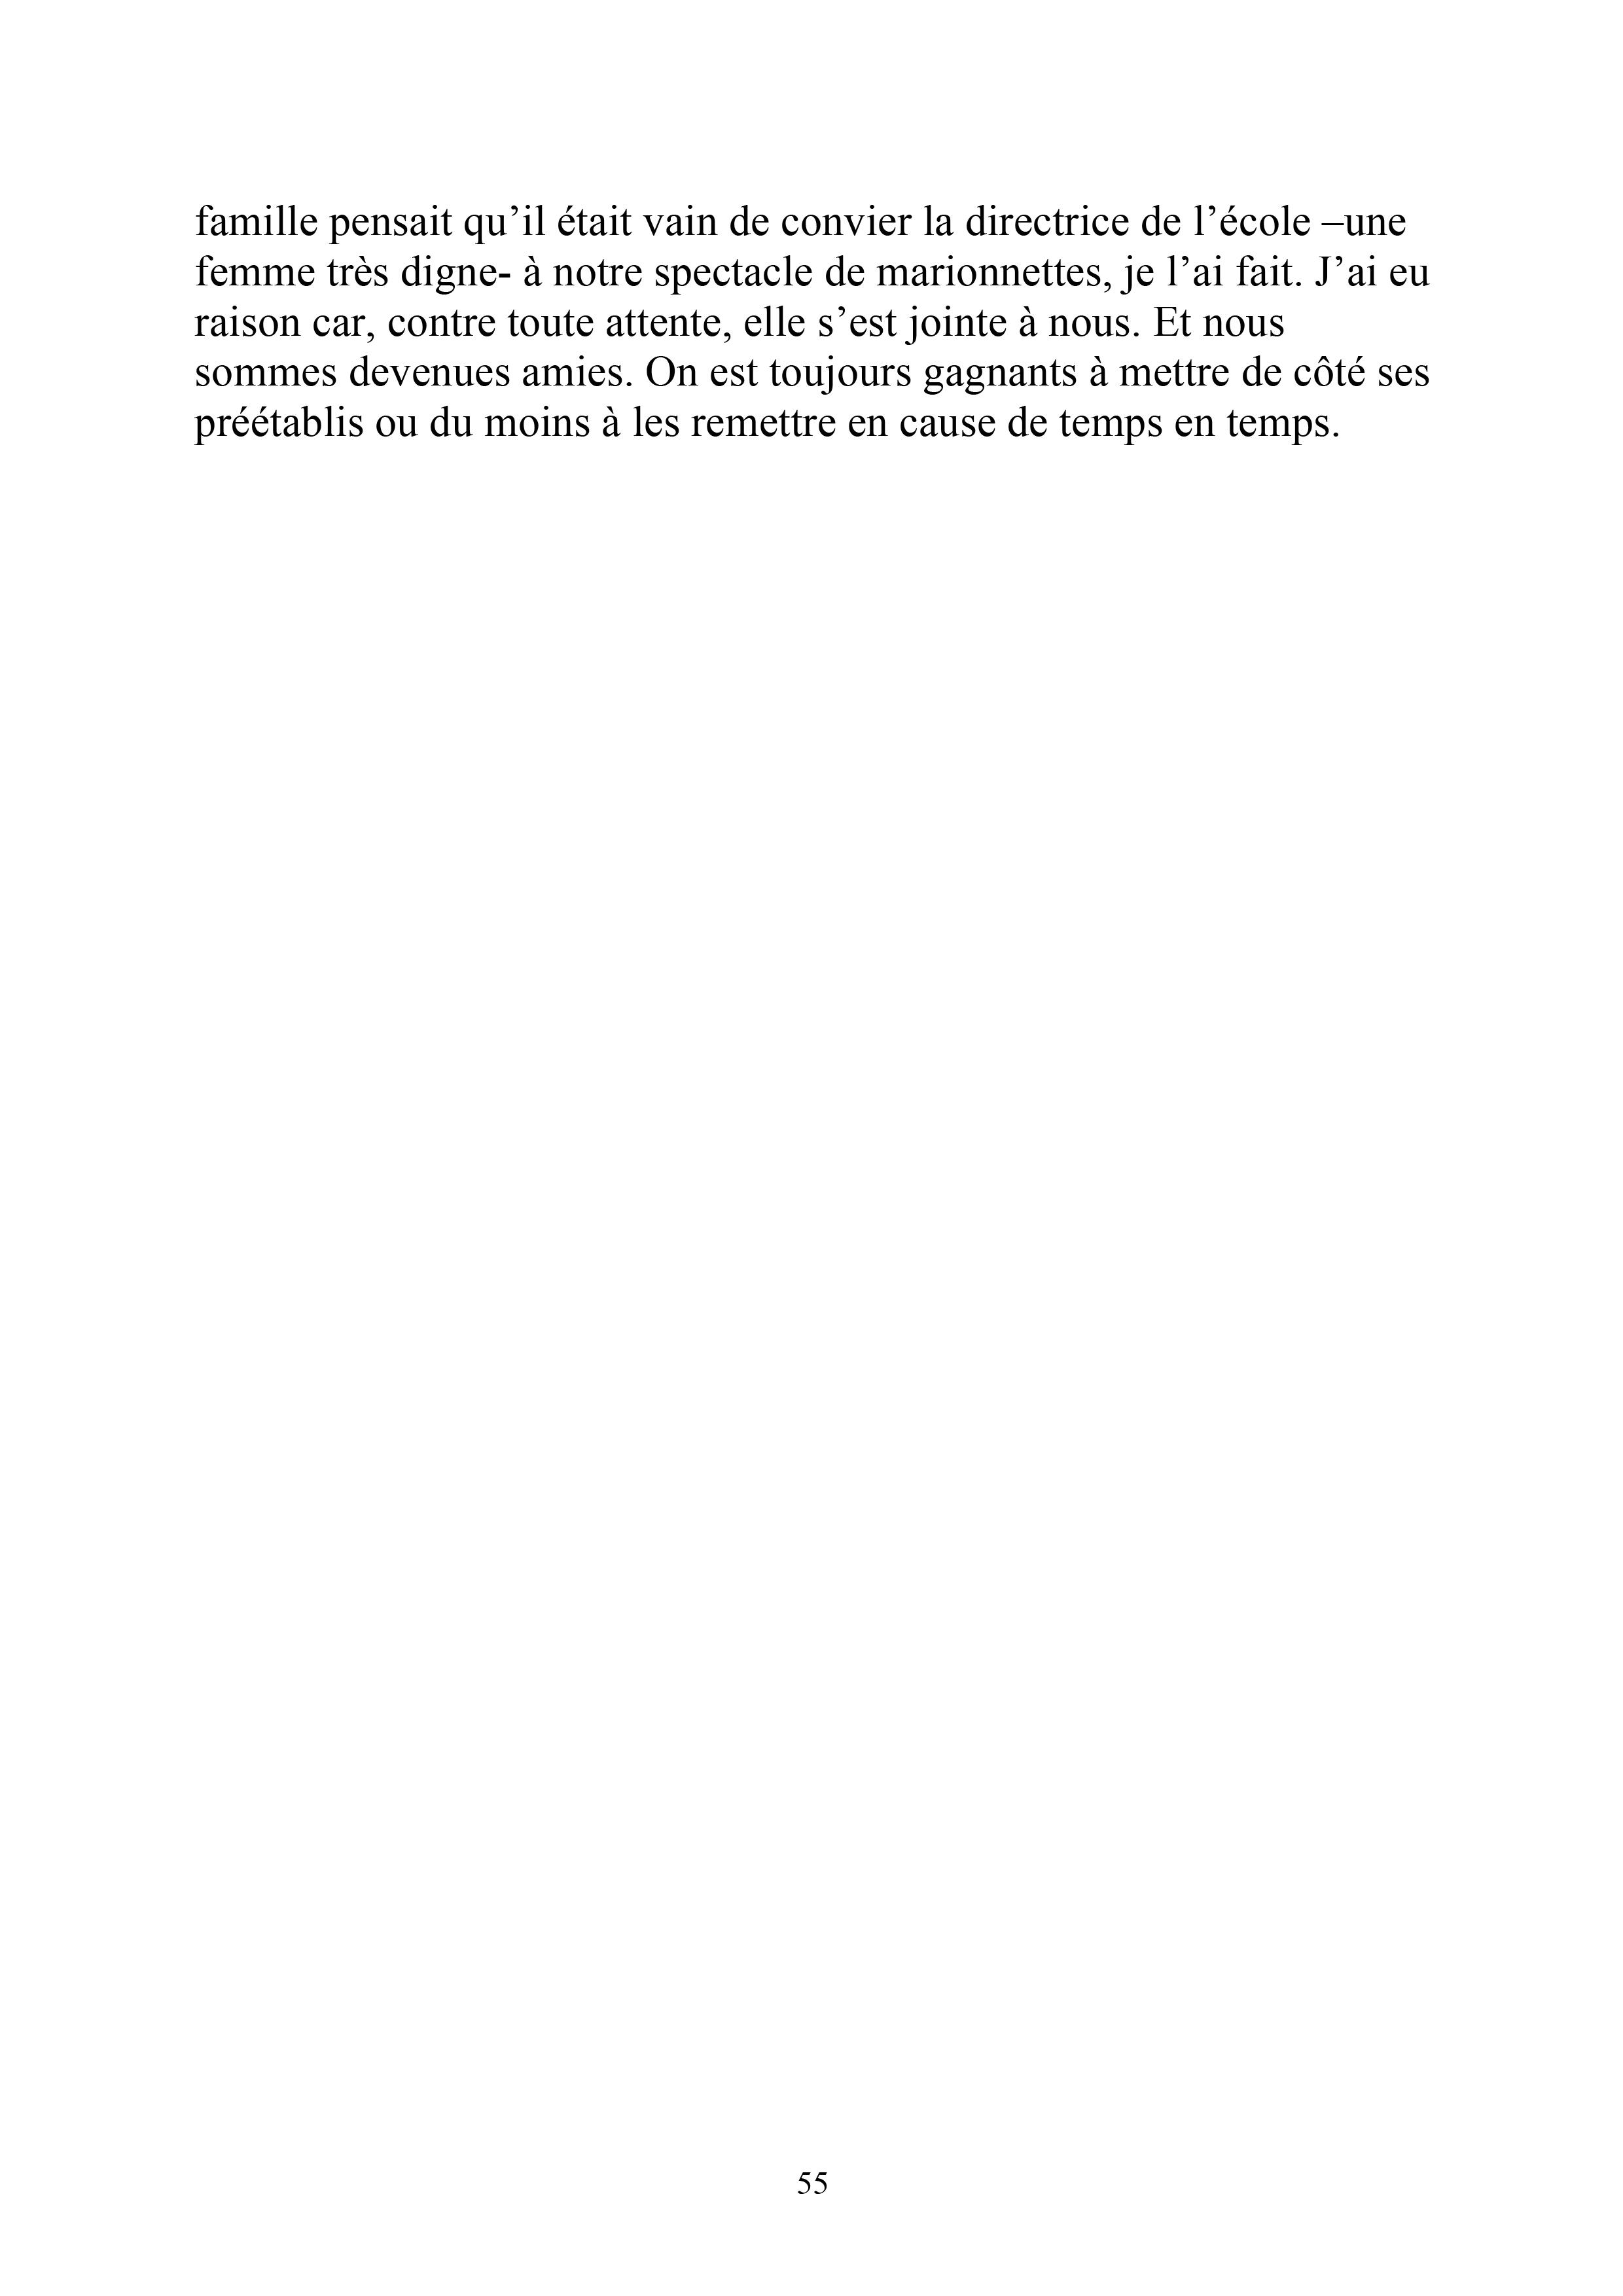 Ebook-Journal de retraite du monastère de solan-55.jpg